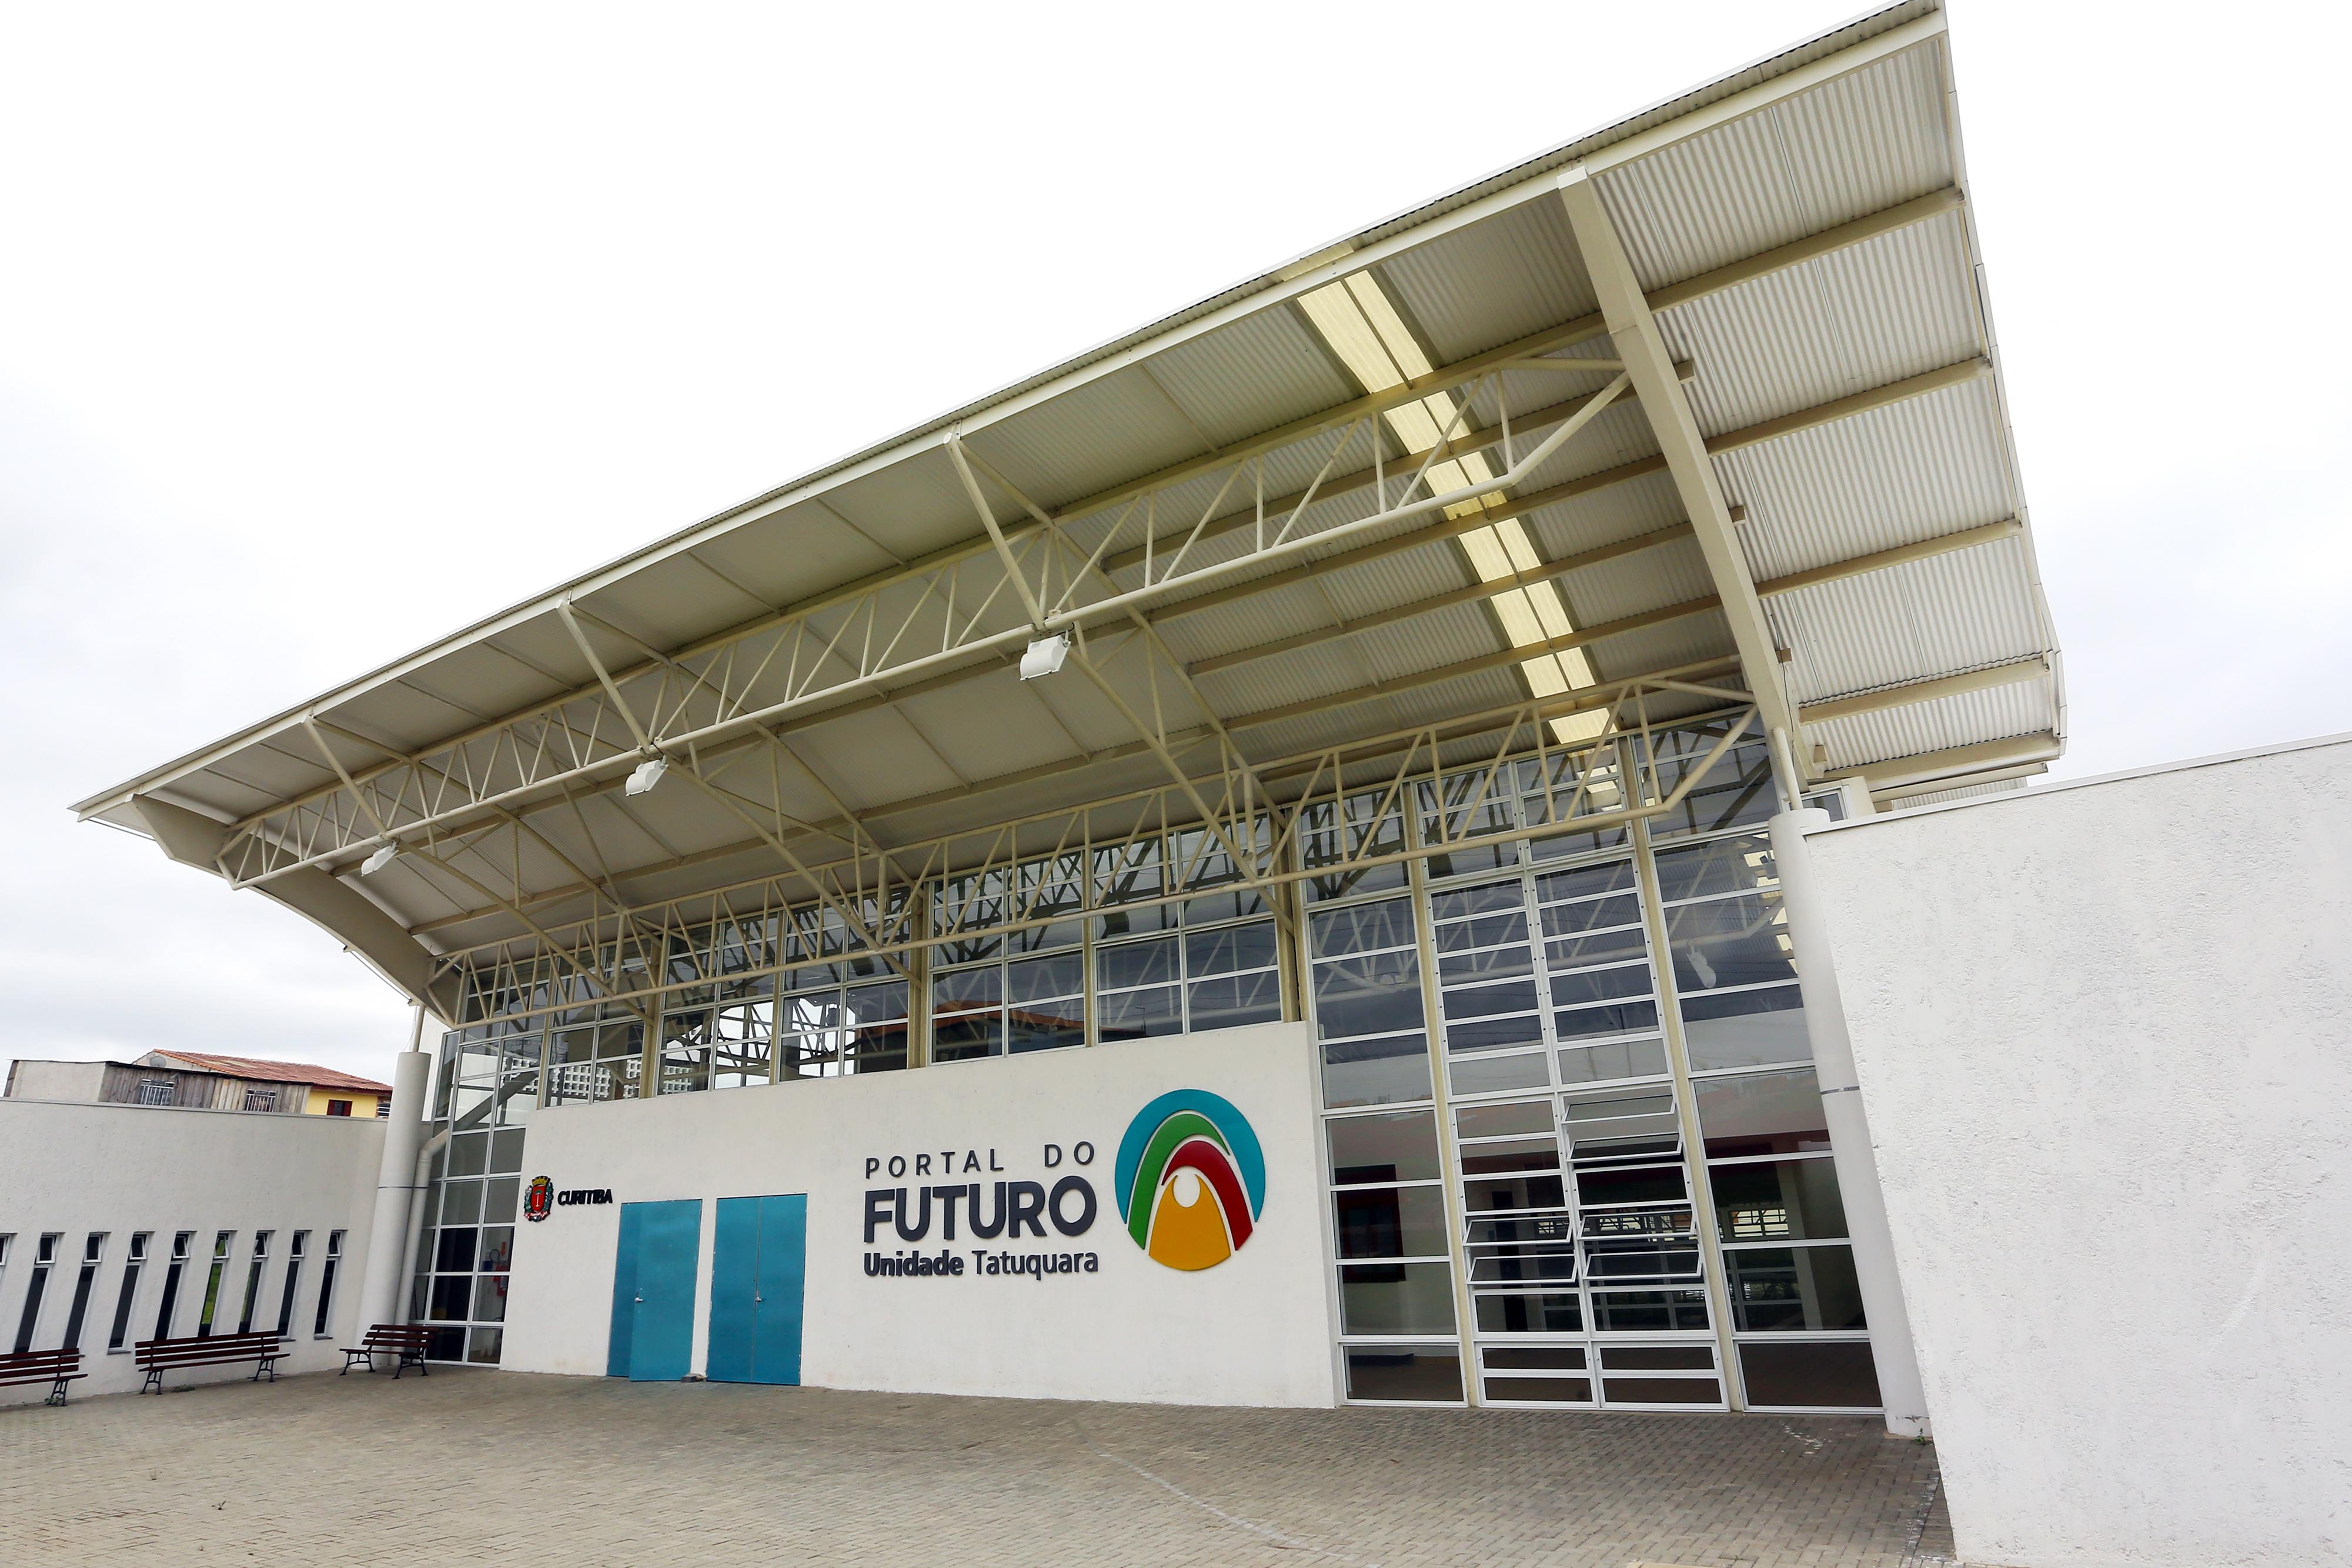 Portal do Futuro - fachada